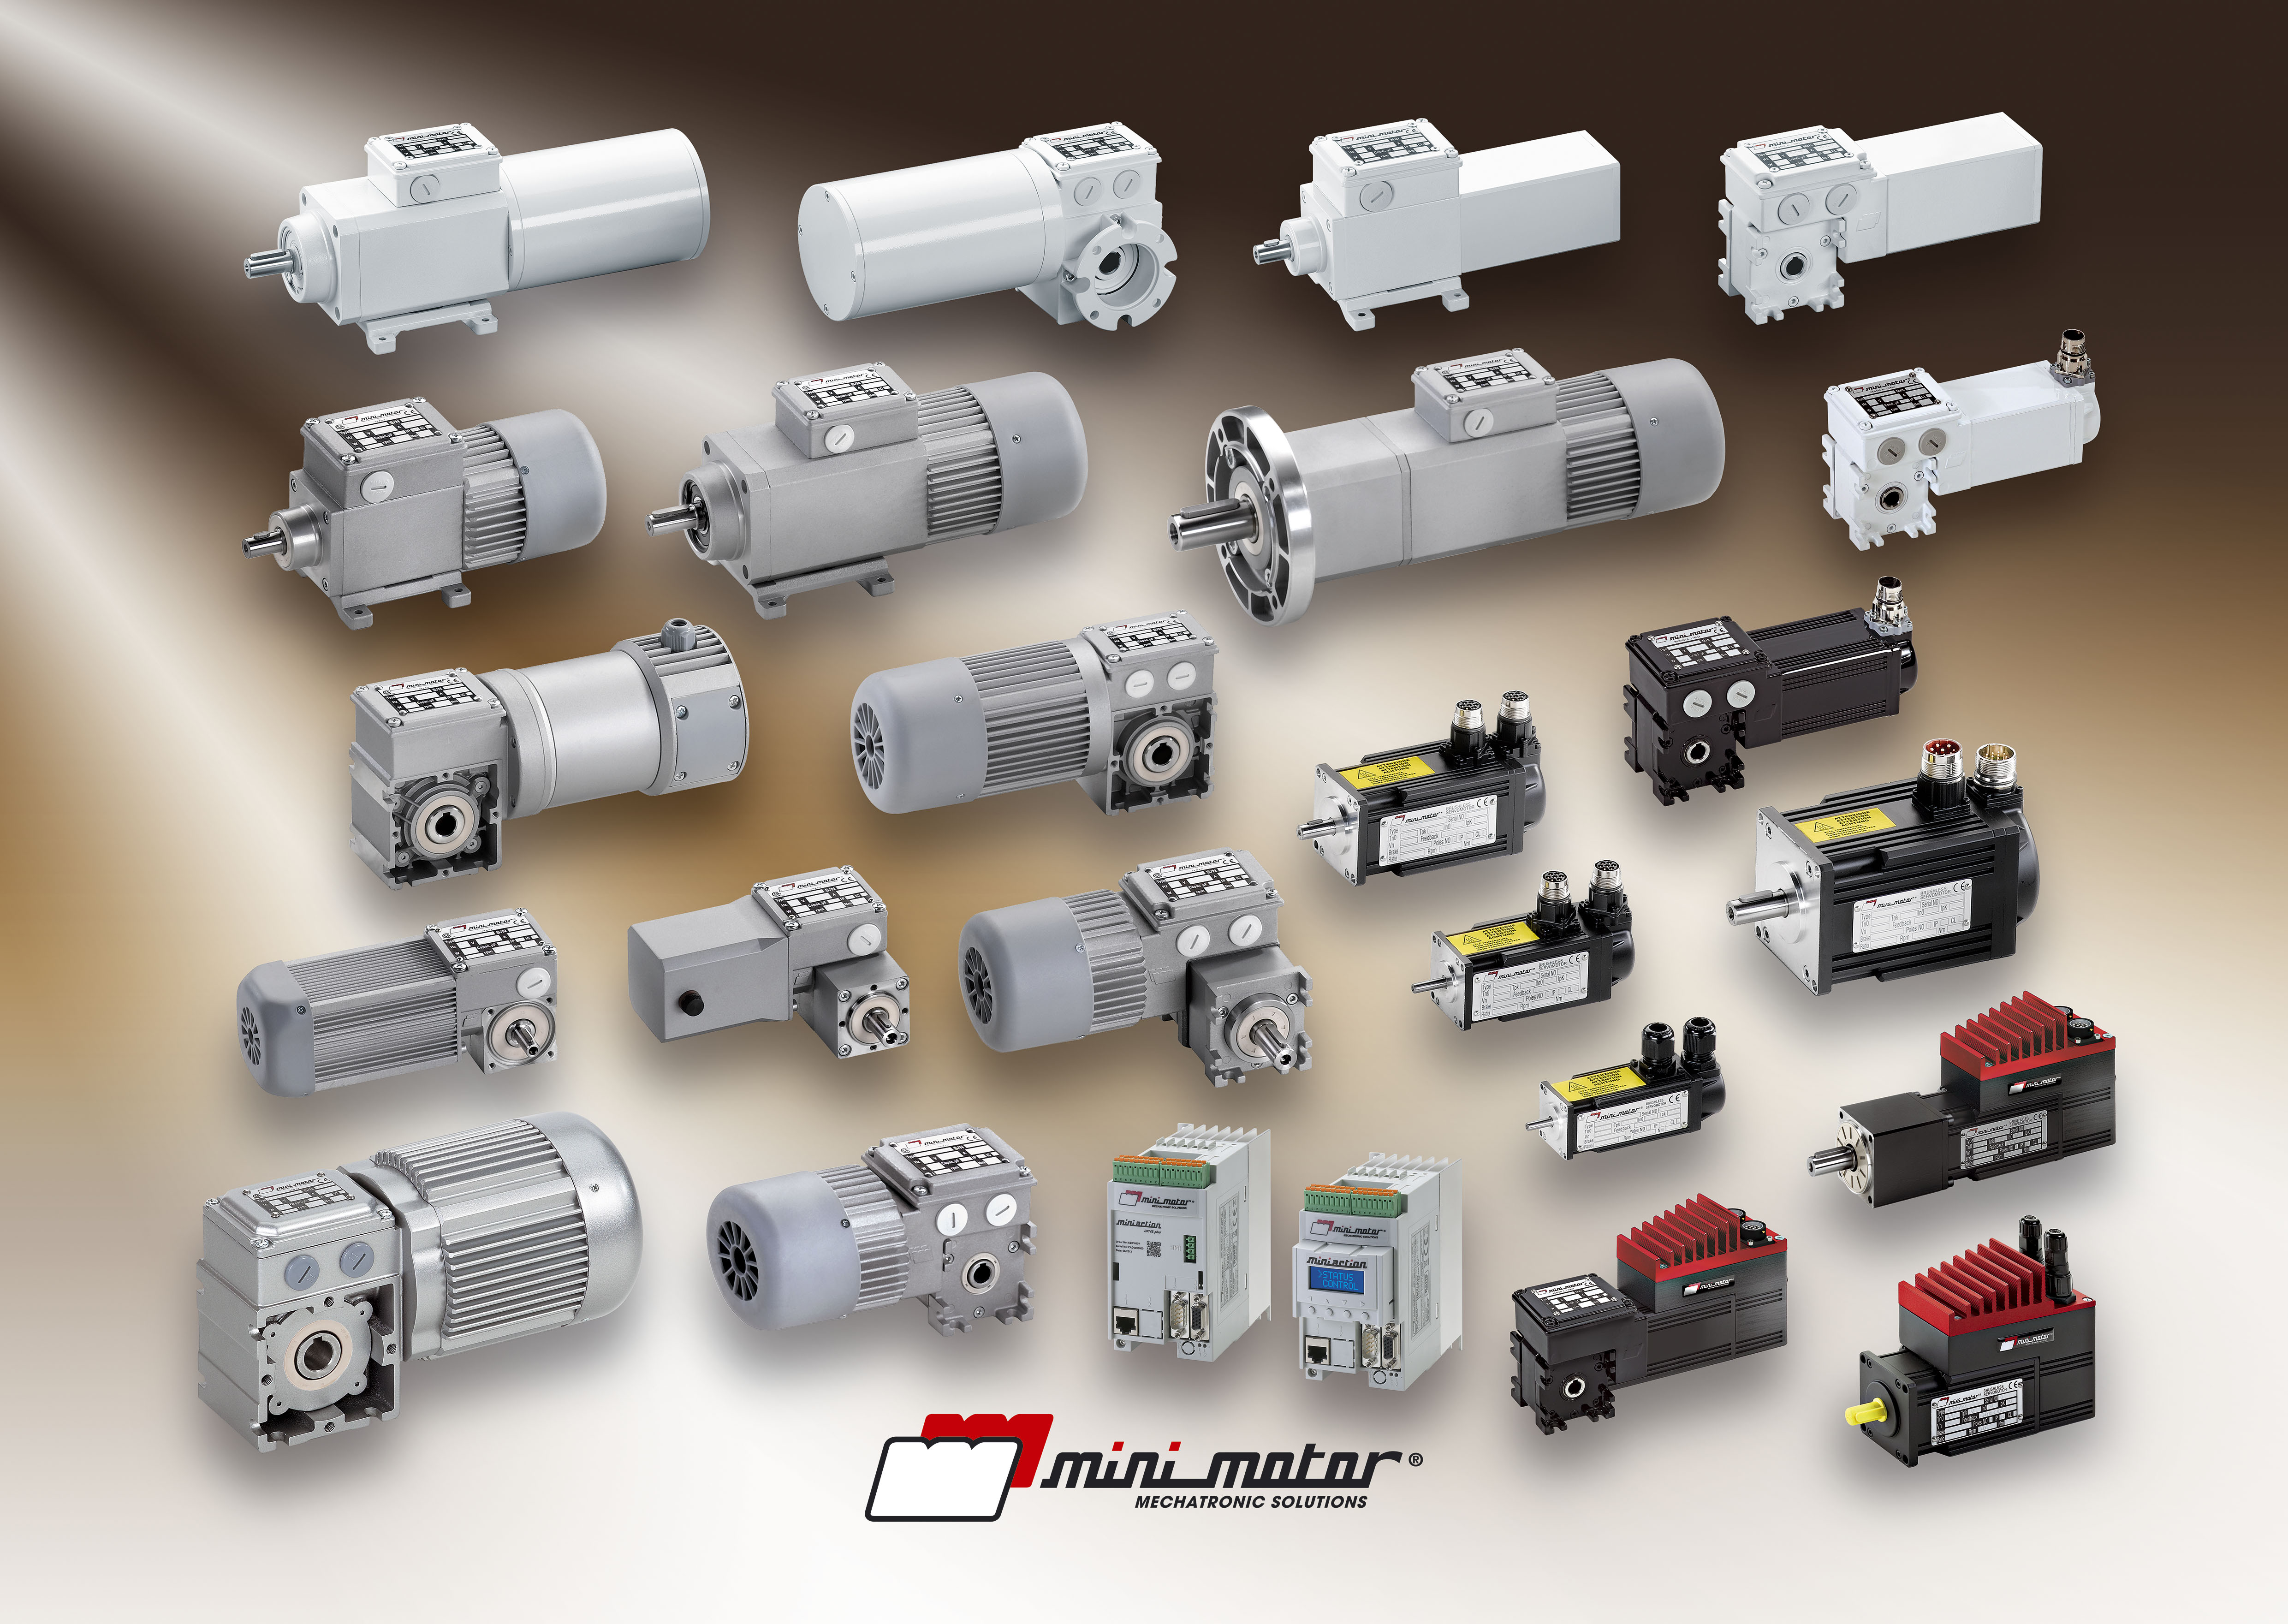 Gamma Mini Motor